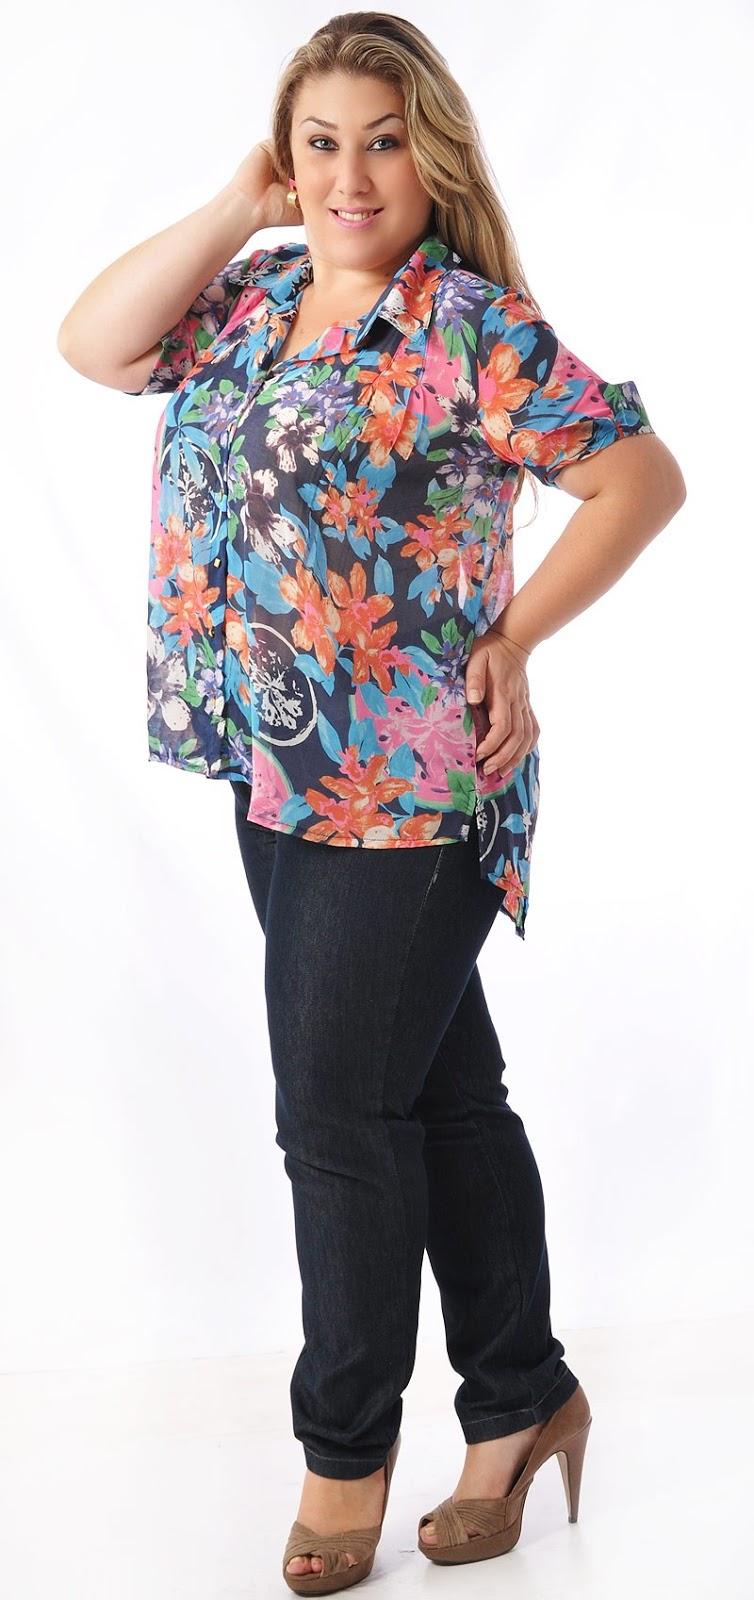 c587633e75d8 Moda Feminina Tamanhos Grandes: Moda Grande Loja Online